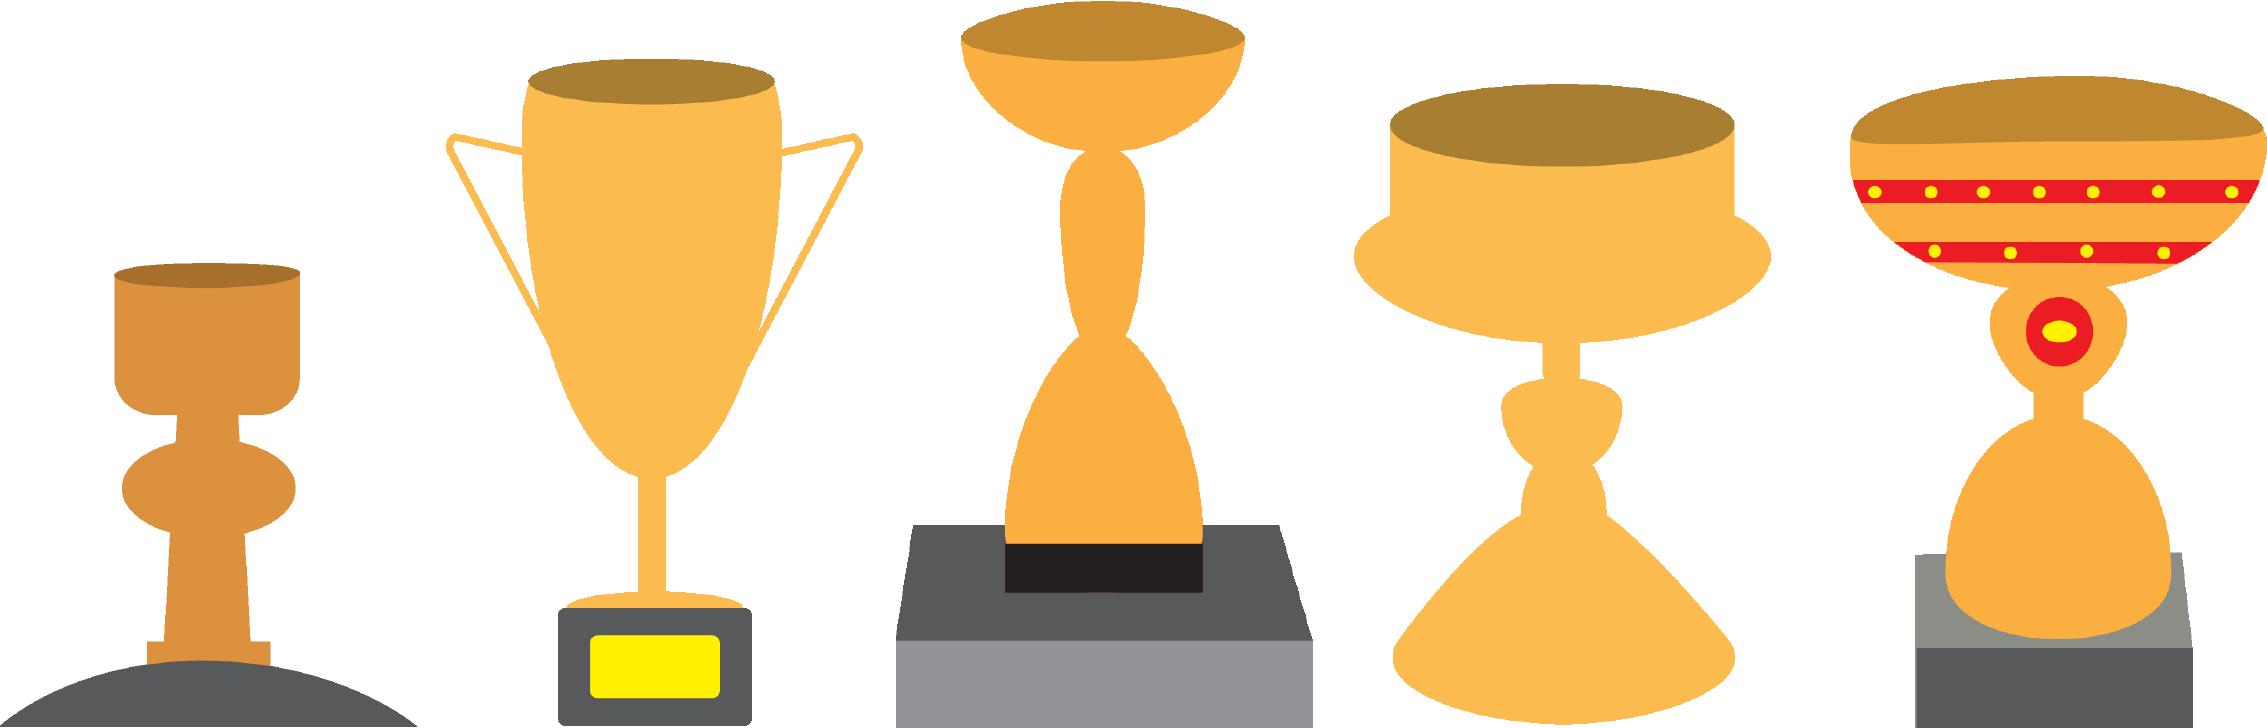 2019 business achievement awards